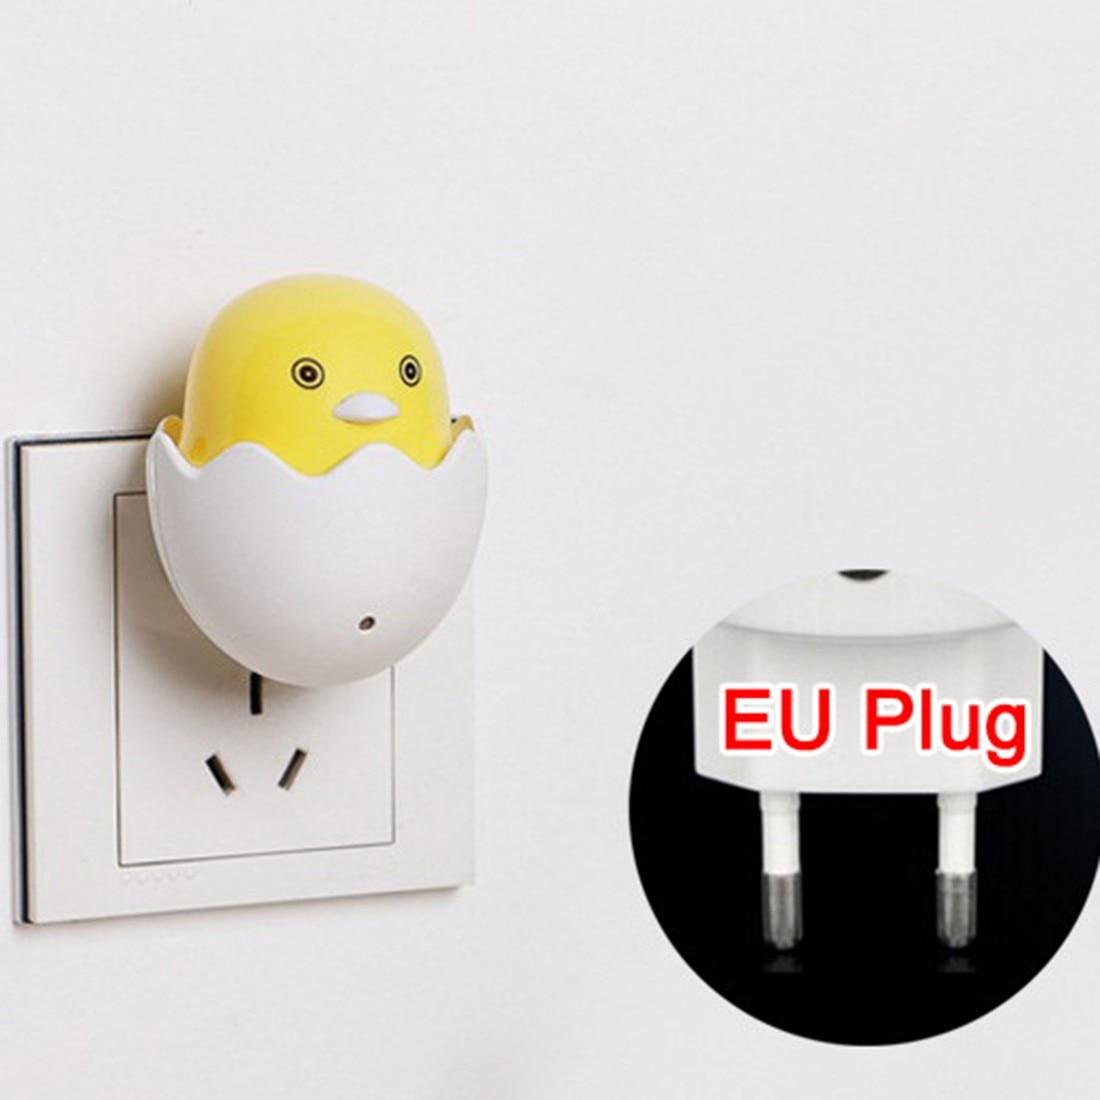 Cute Yellow Duck Bedroom Lamp Gift For Children EU Plug Wall Socket Lamps LED Night Light AC 220V Light Control Sensor